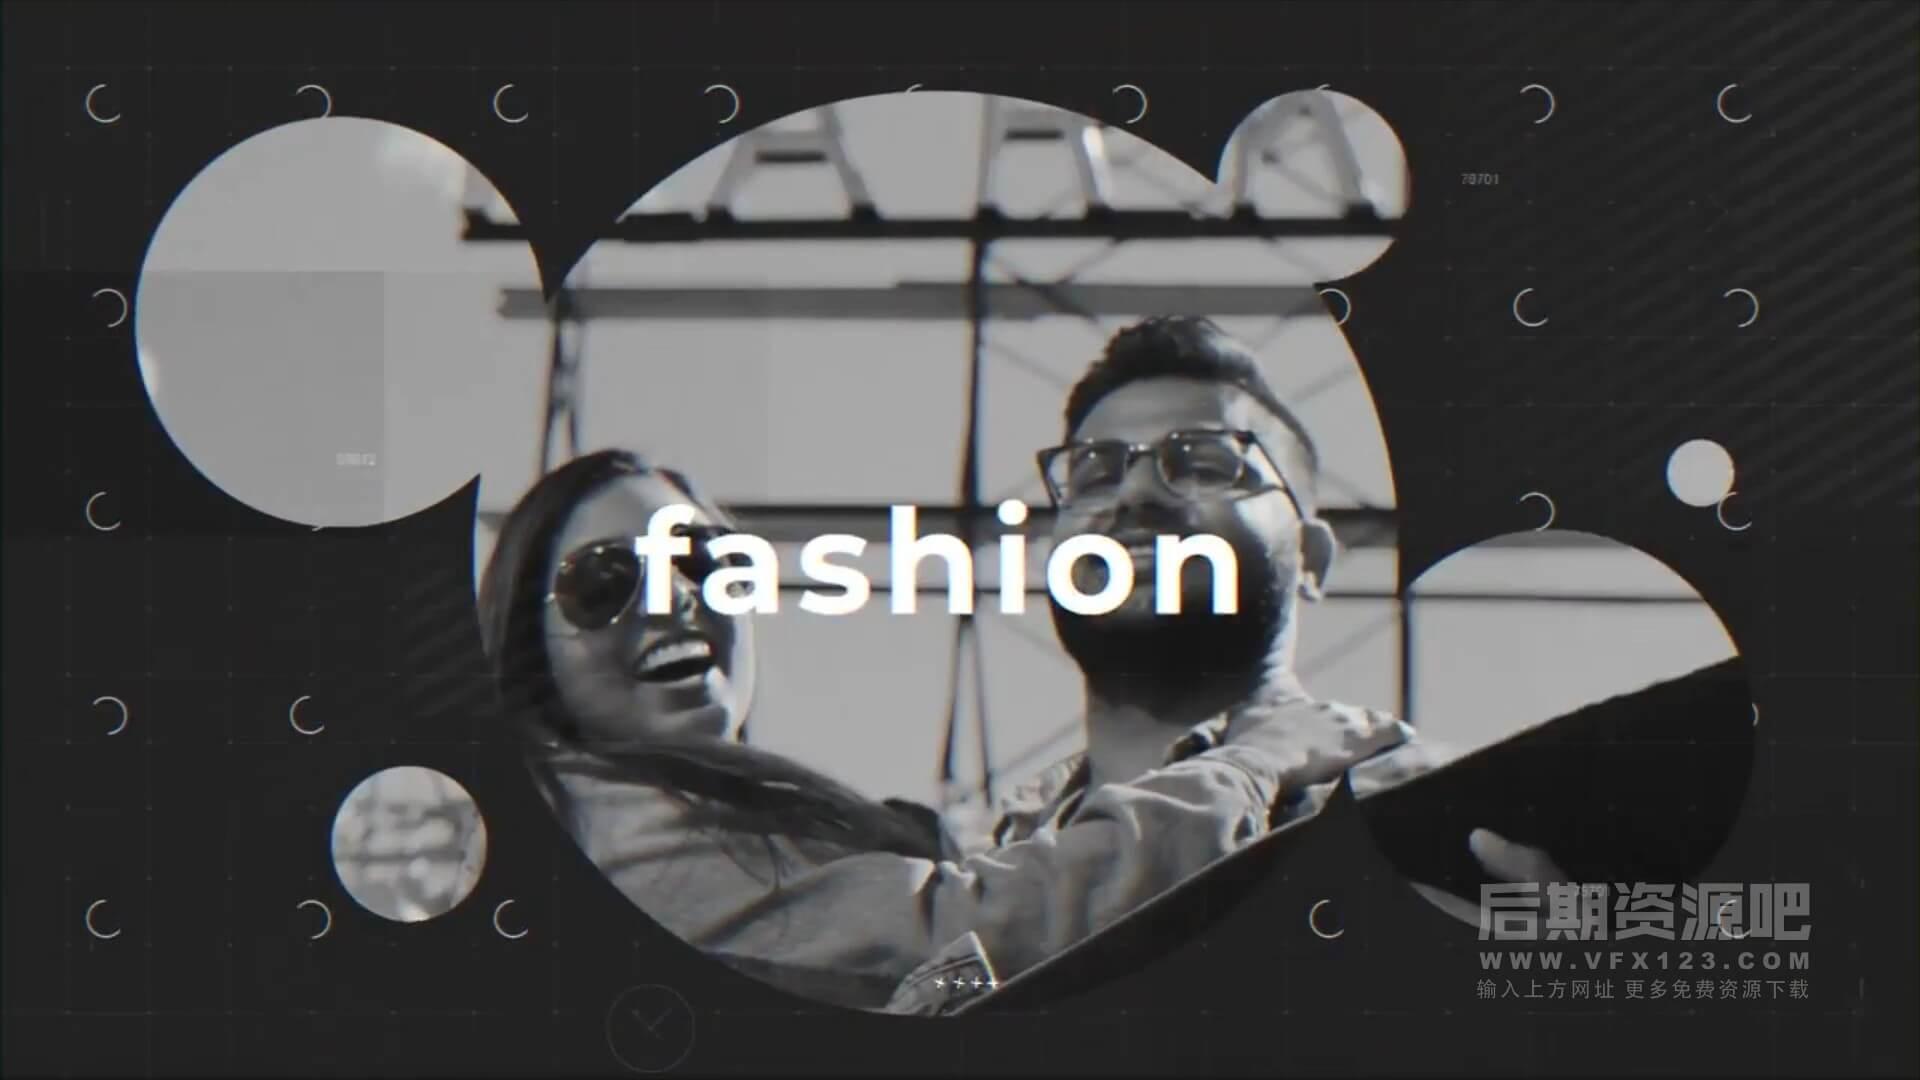 Fcpx主题模板 时尚旅行个人写真开场片头 Modern Trend